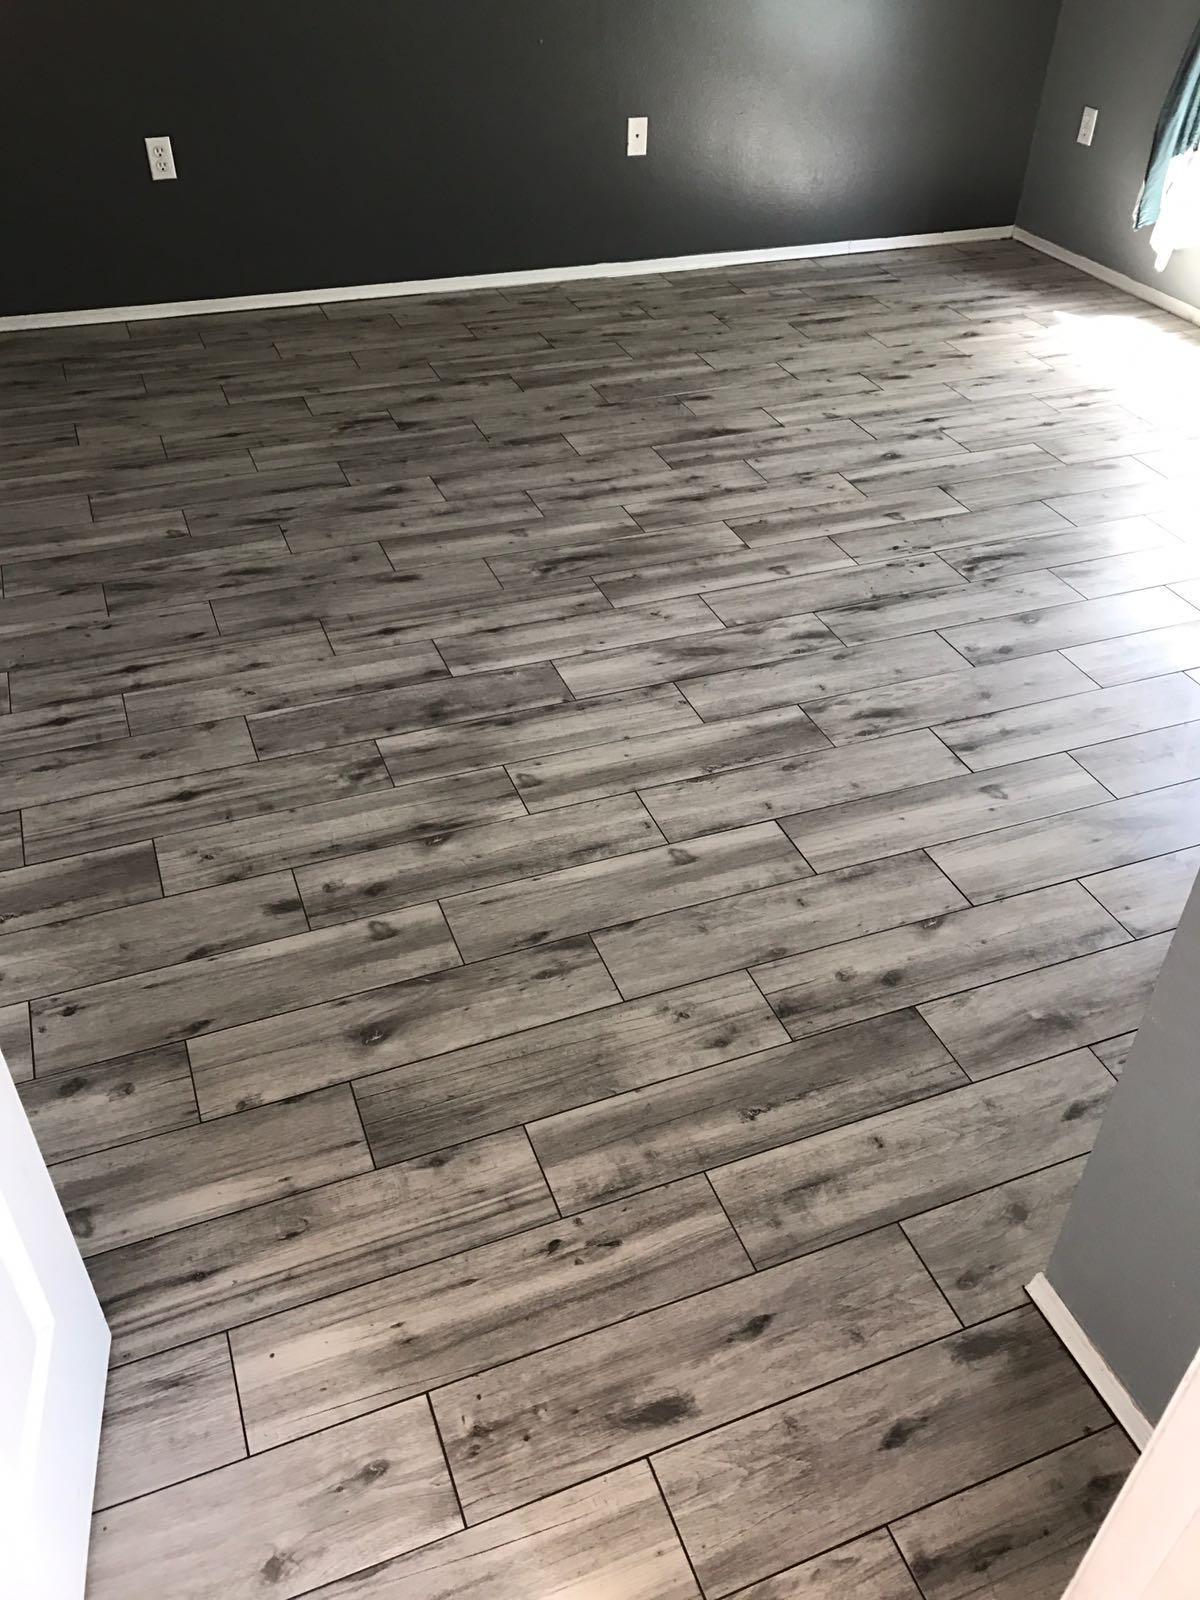 Wood-Look Plank Tile